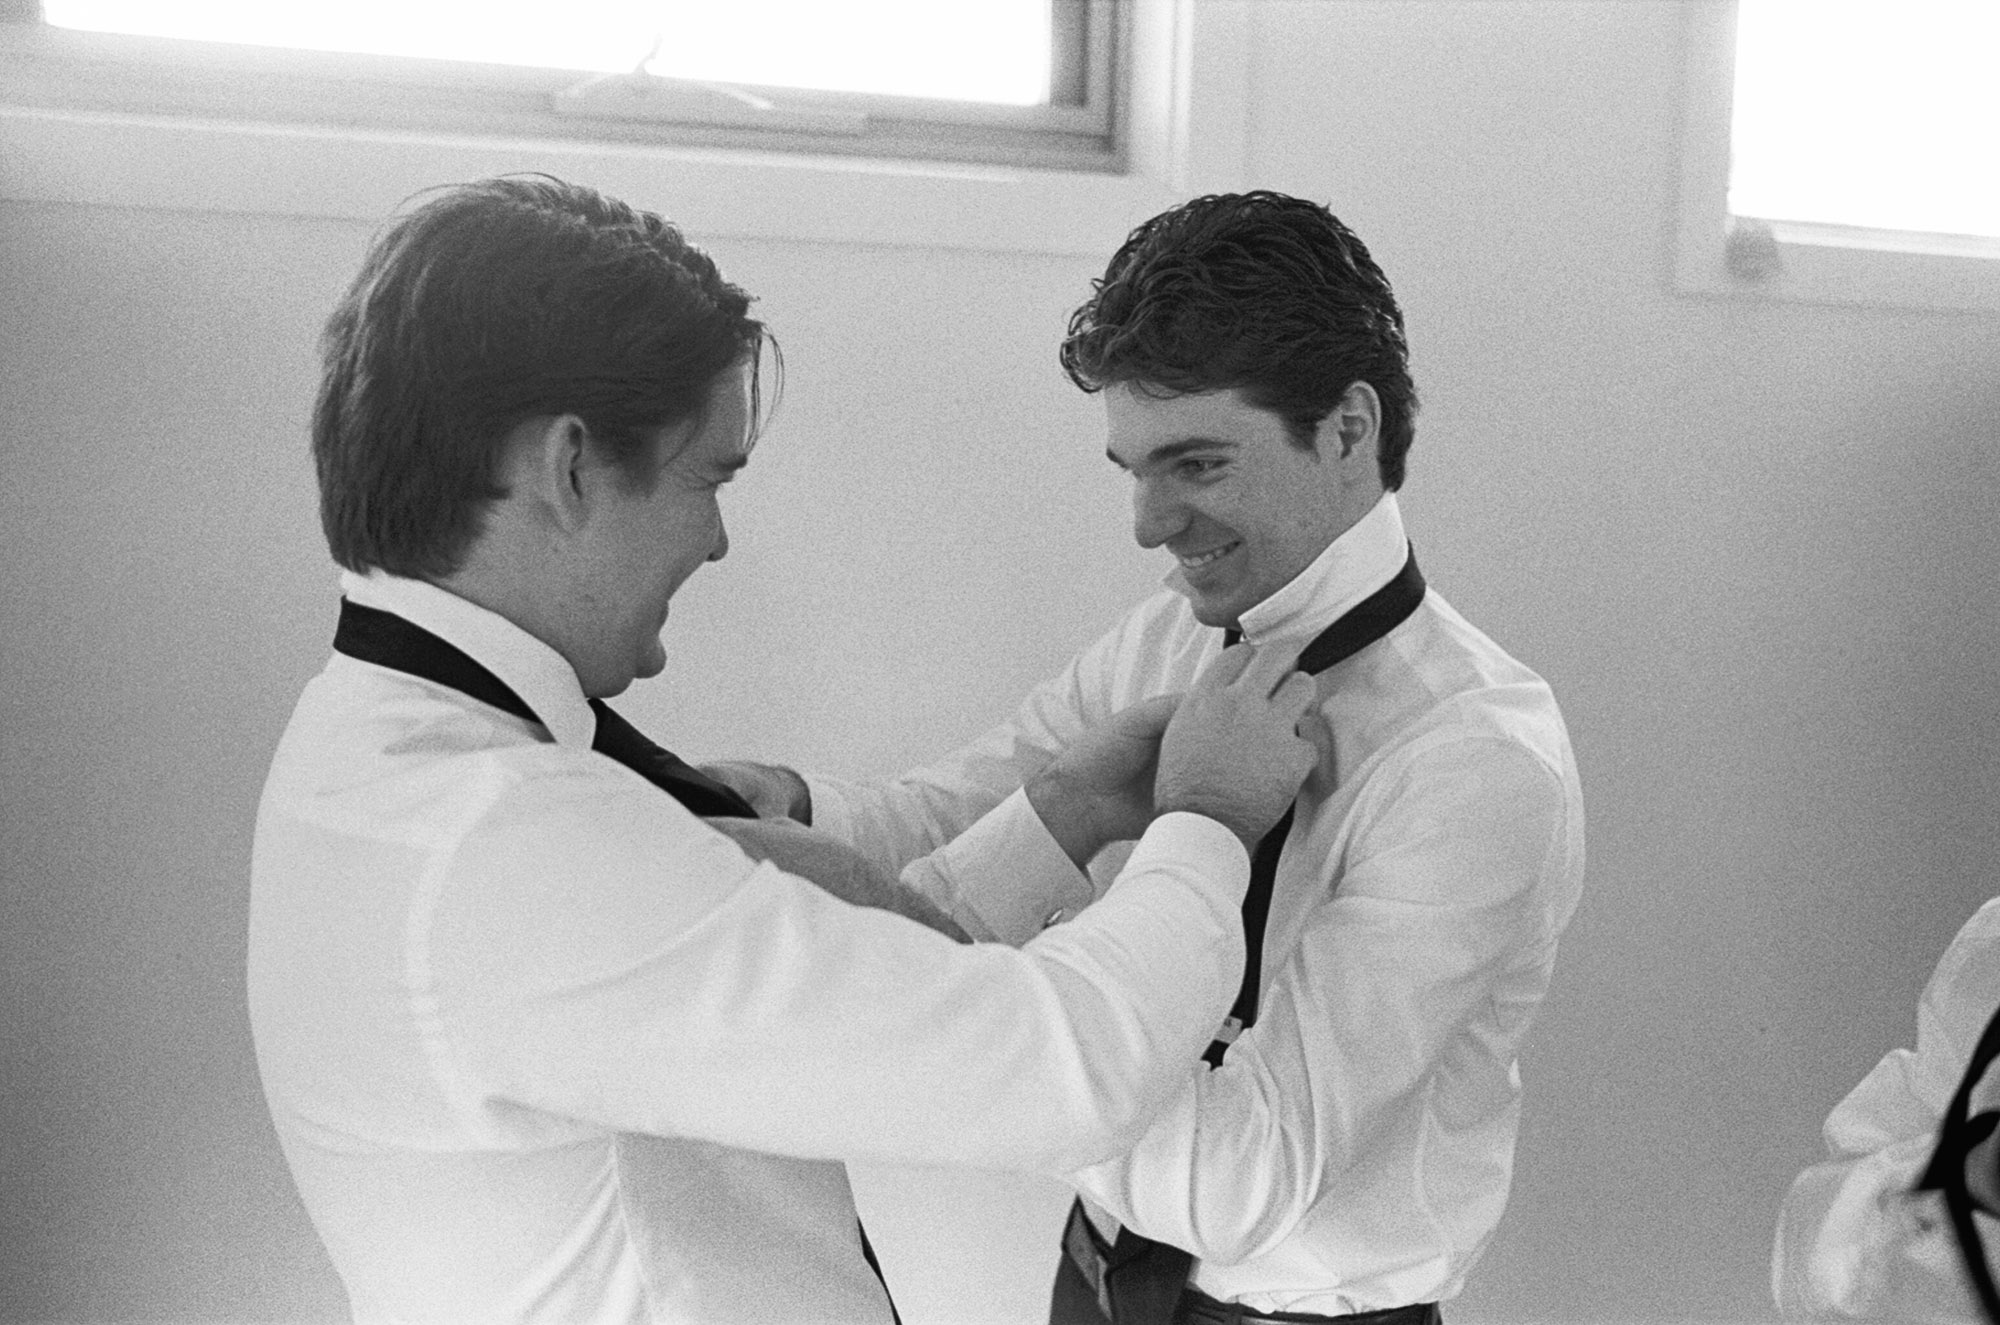 Mount-Lofty-House-wedding-photography-007.jpg